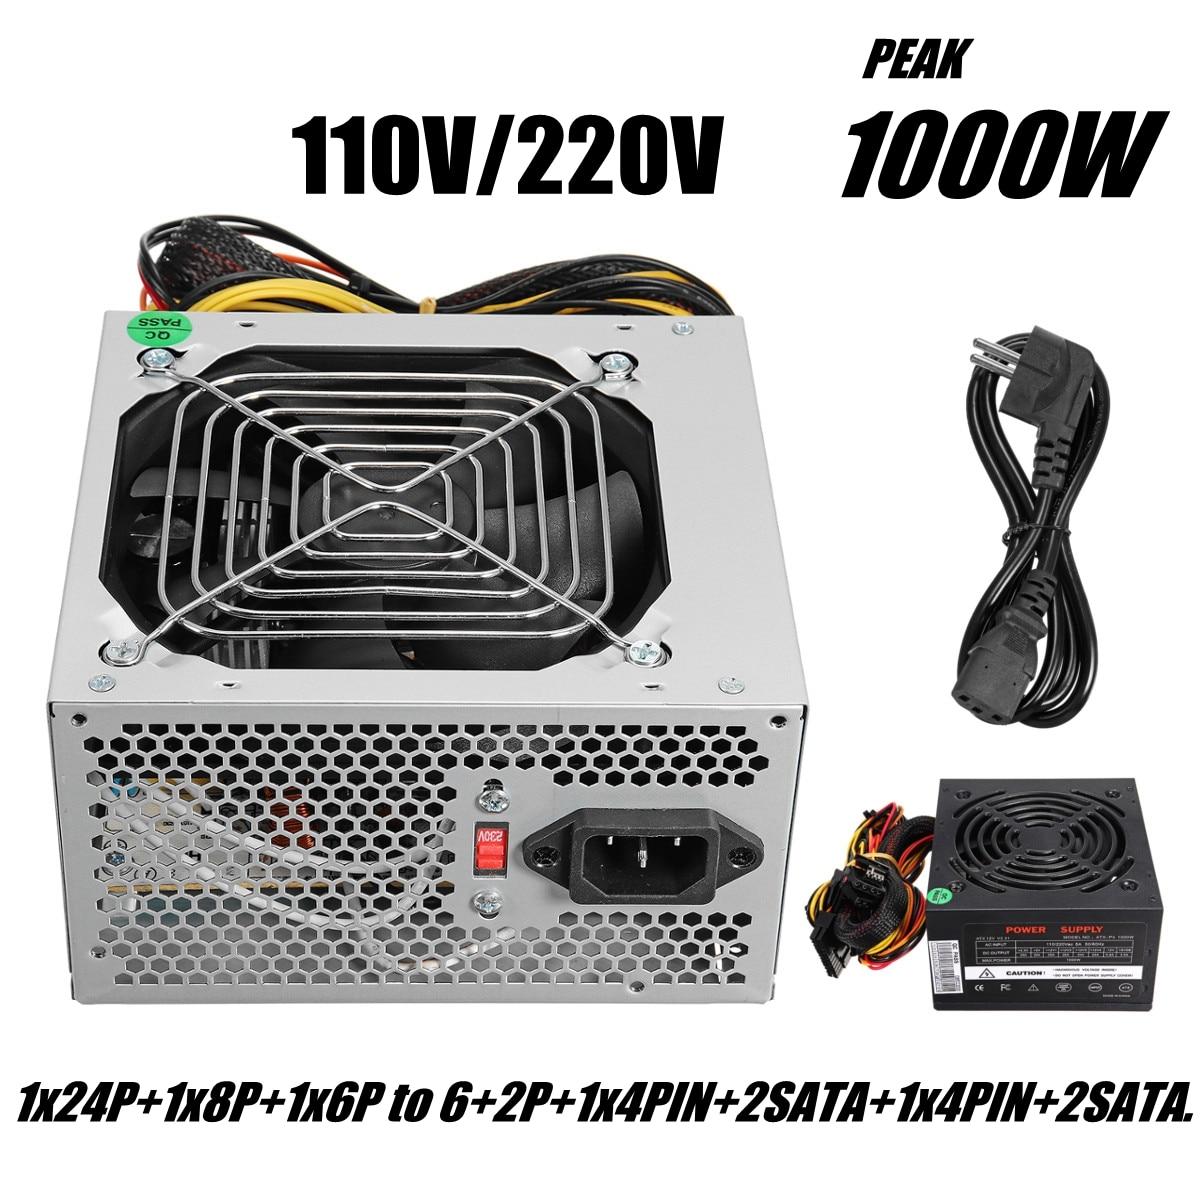 Max 1000W ATX Power Supply Quiet Fan For Intel AMD PC PSU PC Computer Miner 400w desktop power supply max 500w psu quiet power switching 12v atx btc sata power supply computer chassis for intel amd pc